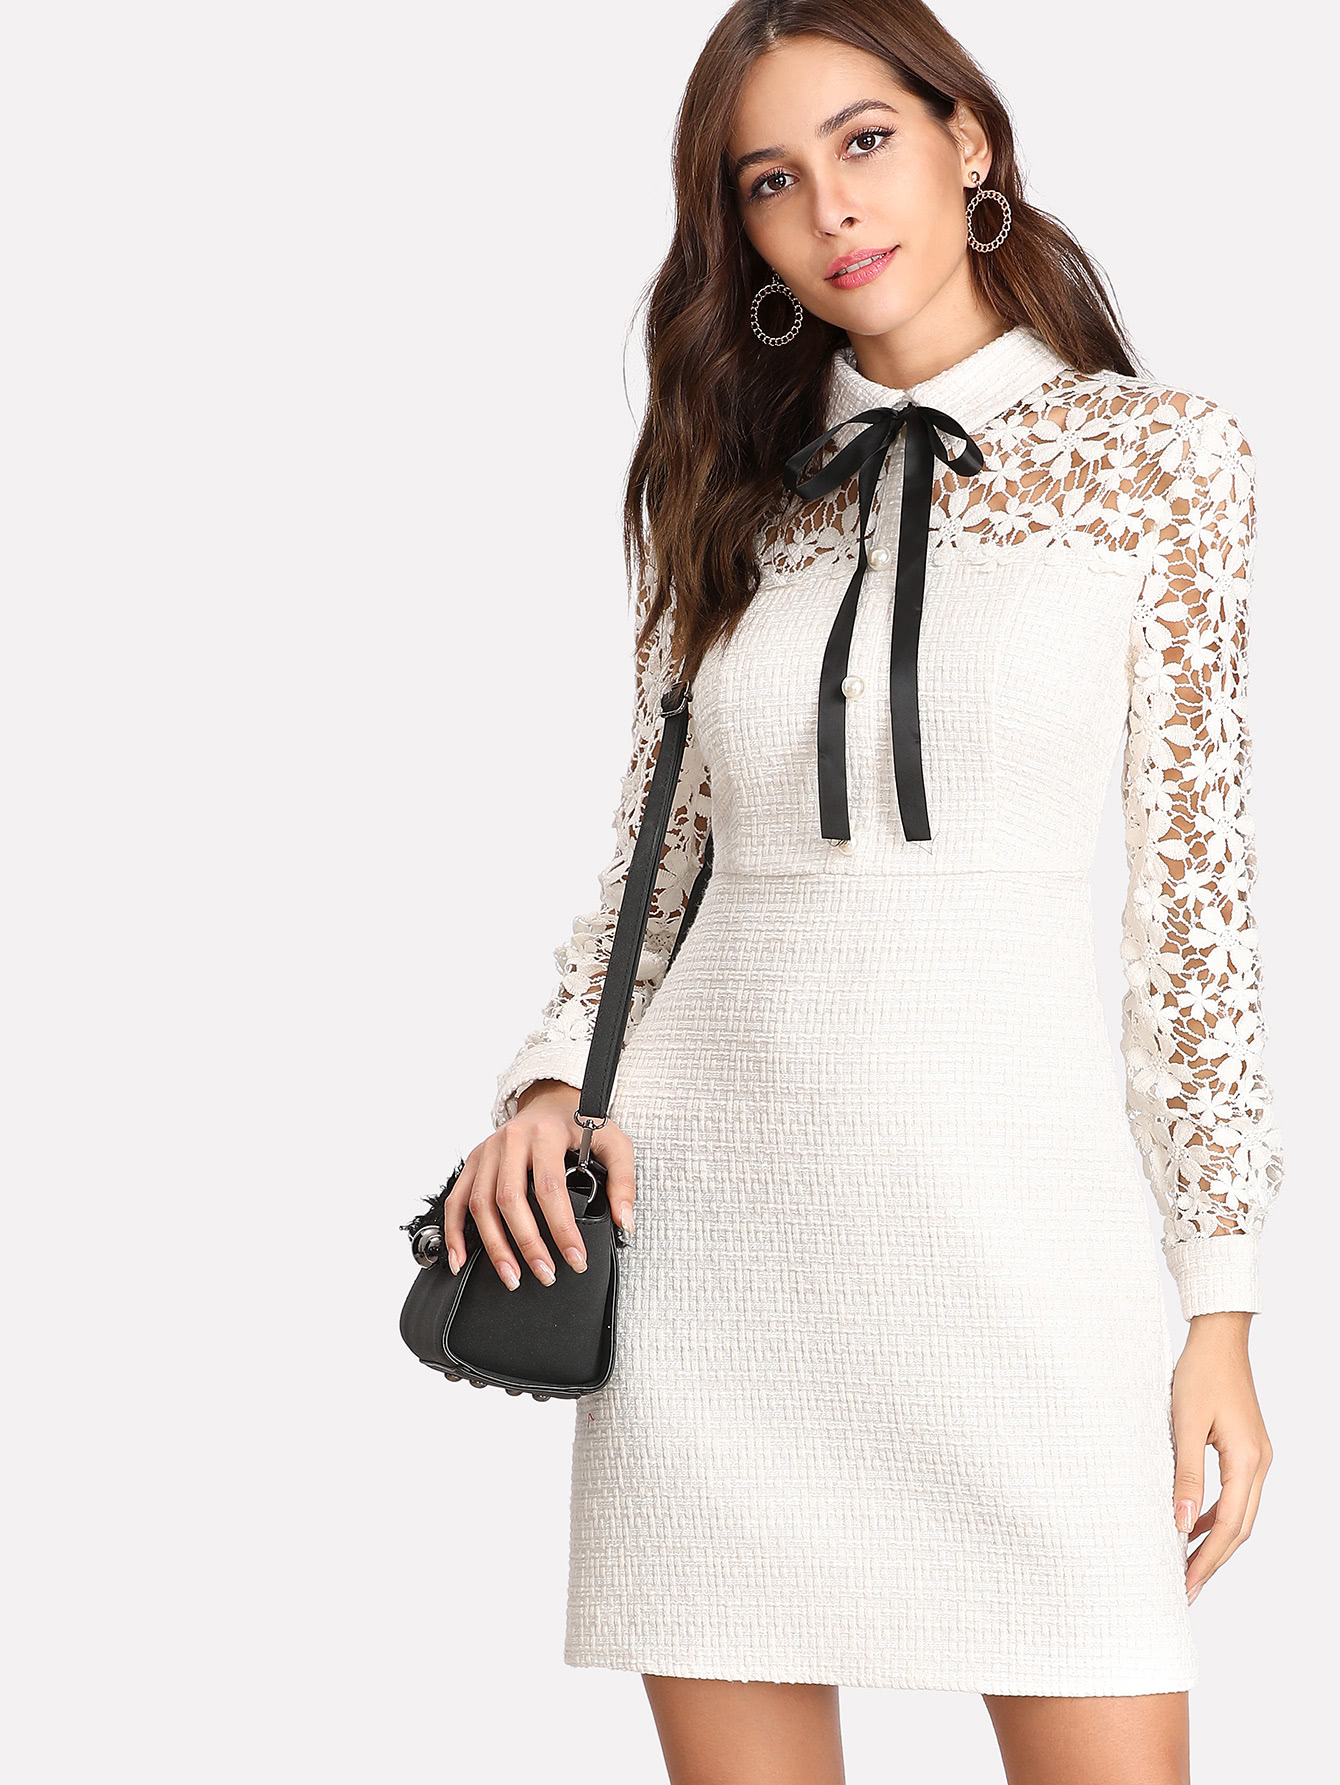 Daisy Lace Sleeve Tie Neck Tweed Dress contrast tie neck faux pocket tweed dress